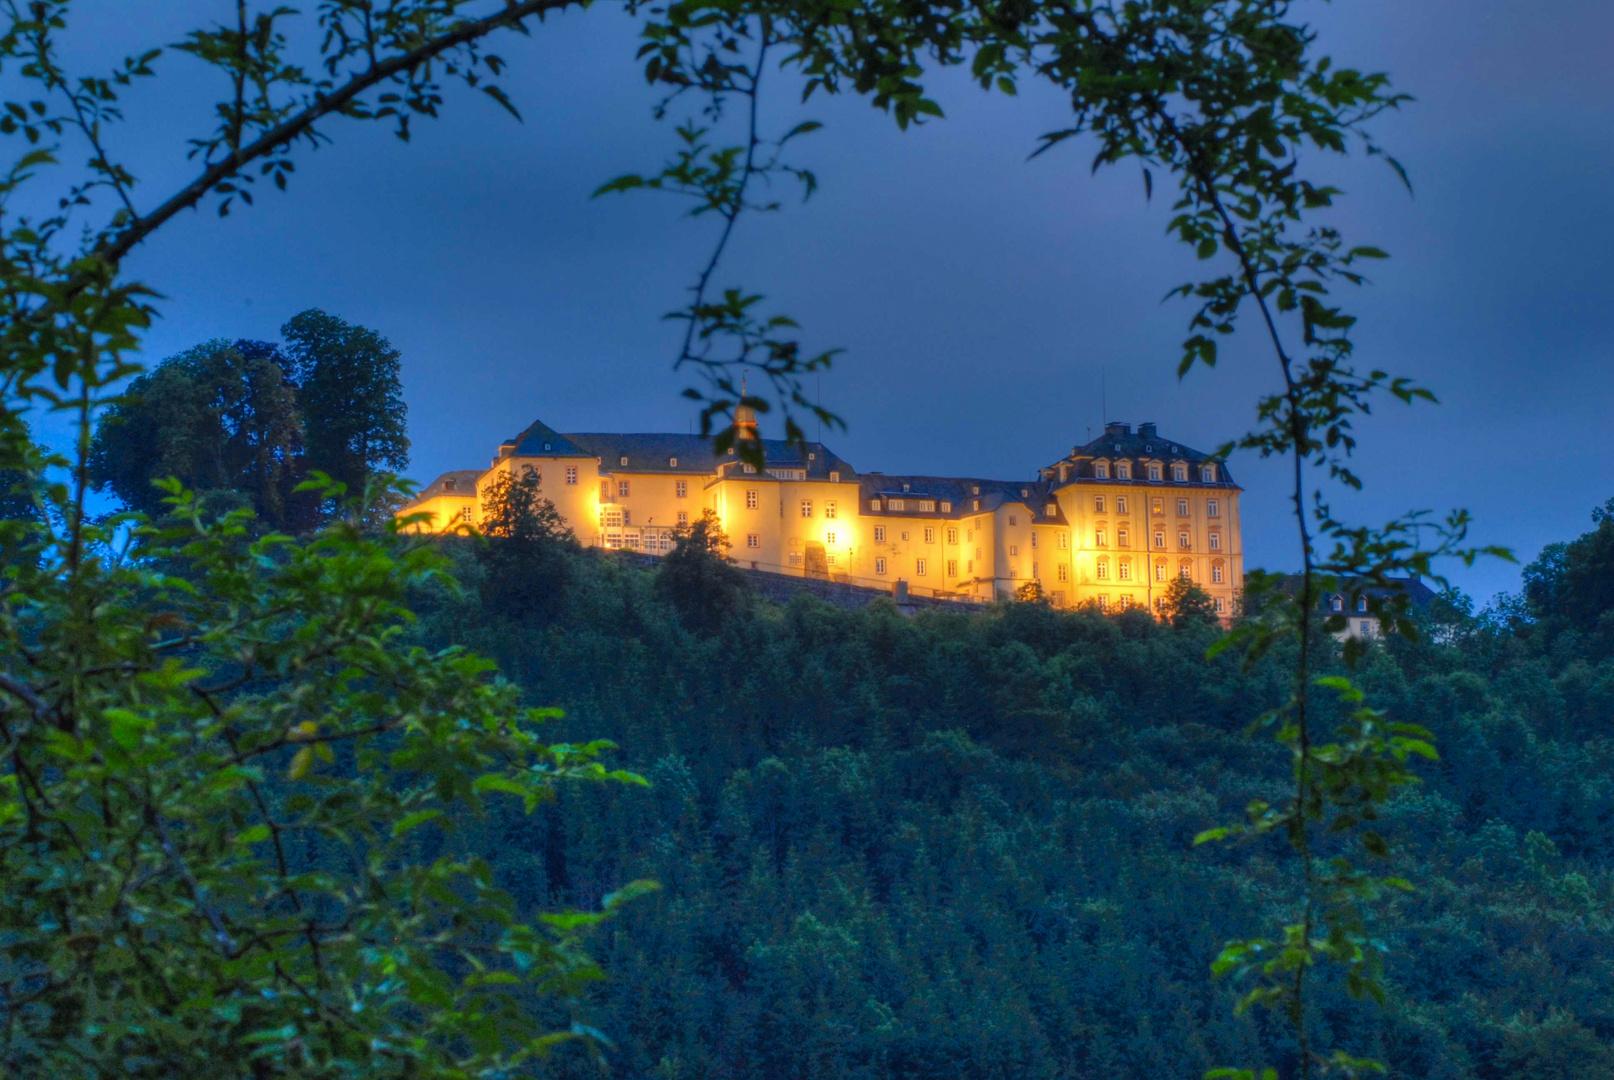 Schloss Wittgenstein Bad Laasphe